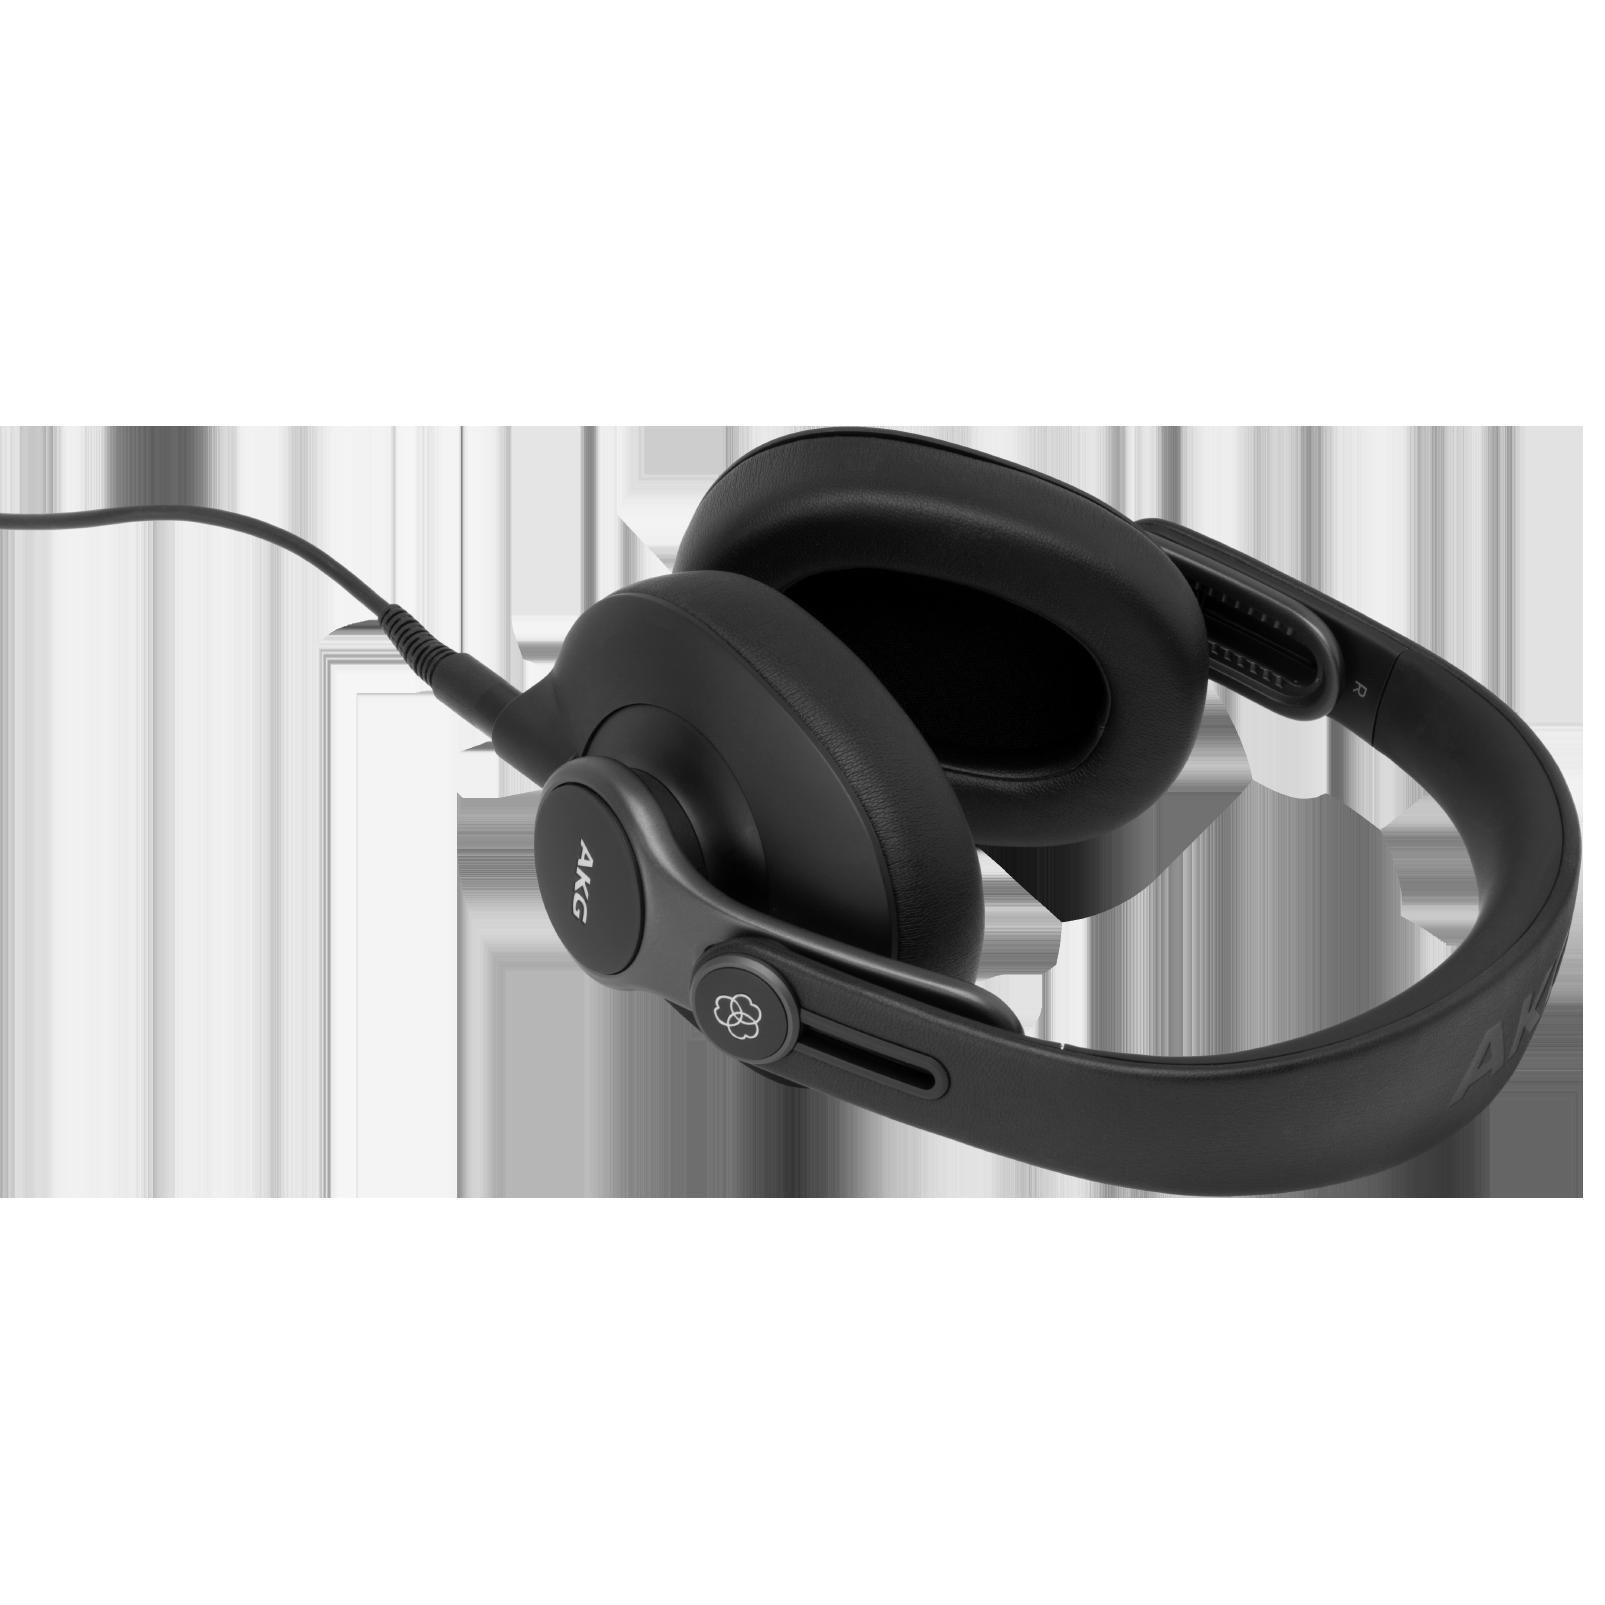 K371 - Black - Over-ear, closed-back, foldable studio headphones - Detailshot 3